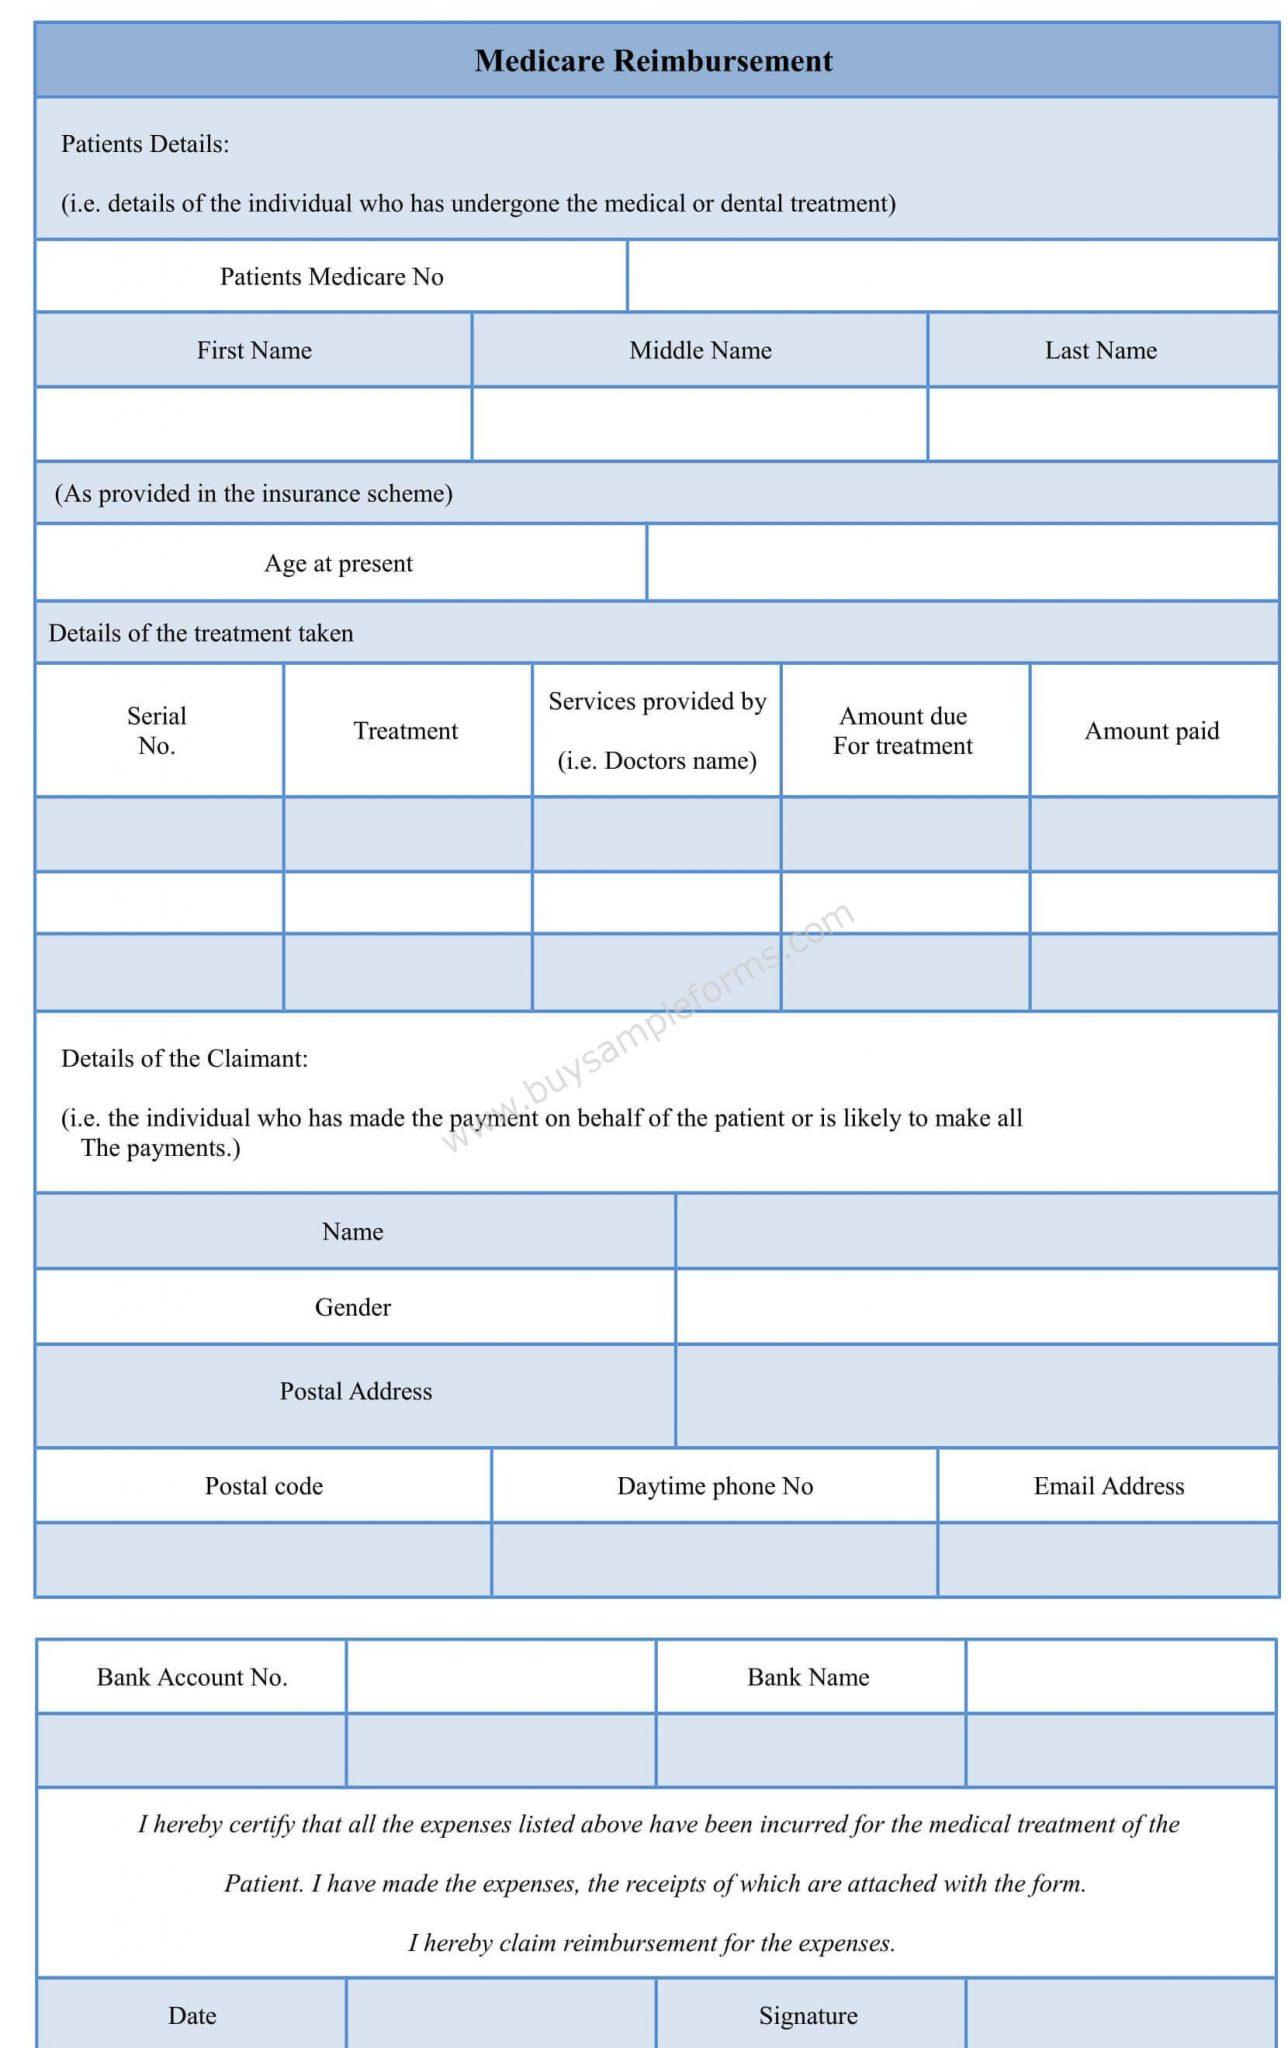 Sample Medicare Reimbursement Form Template